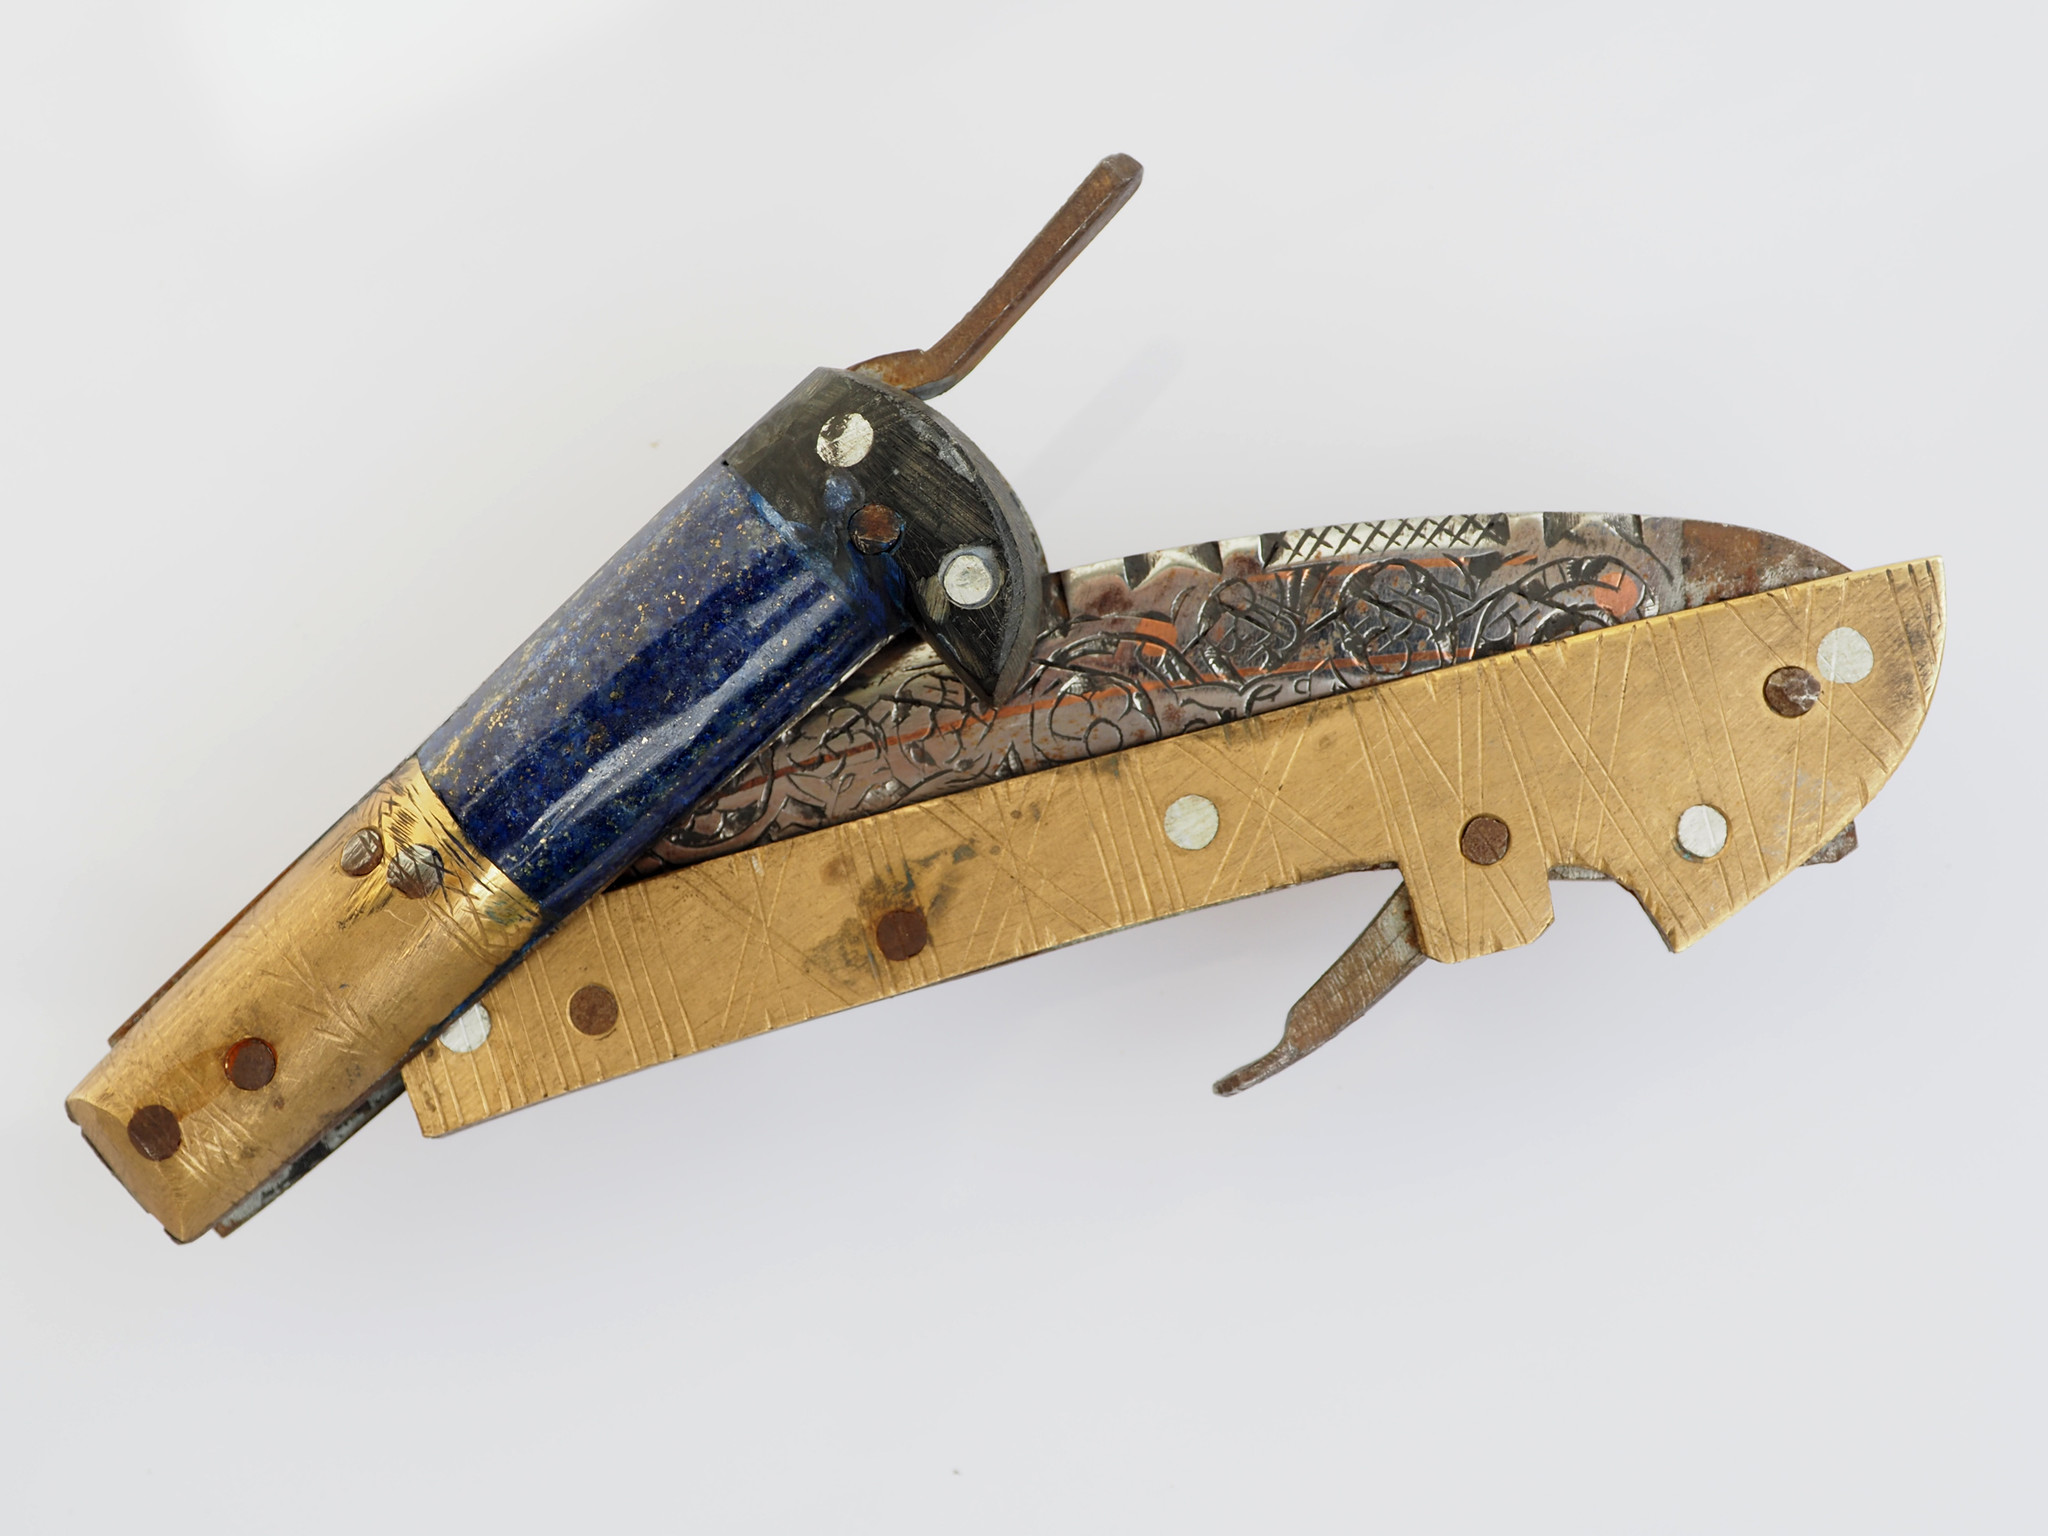 27 cm Messer Dolch choora dagger lohar Khybe messer Klappsense  Sense aus Afghanistan Pakistan Nr:21G